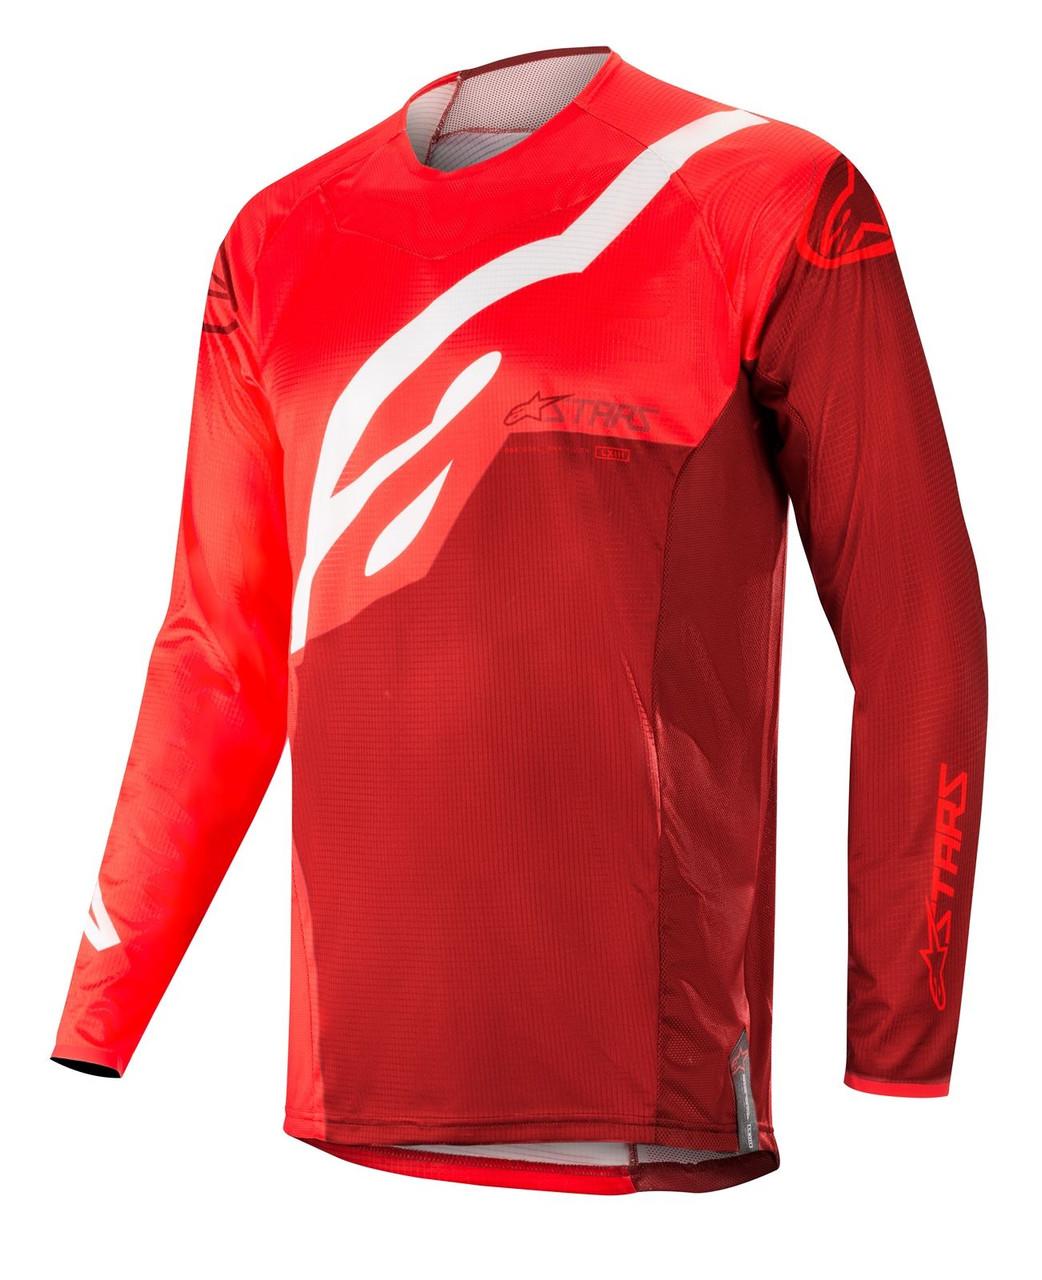 2019 Alpinestars Techstar Factory Jersey Red Burgundy bf5581f23